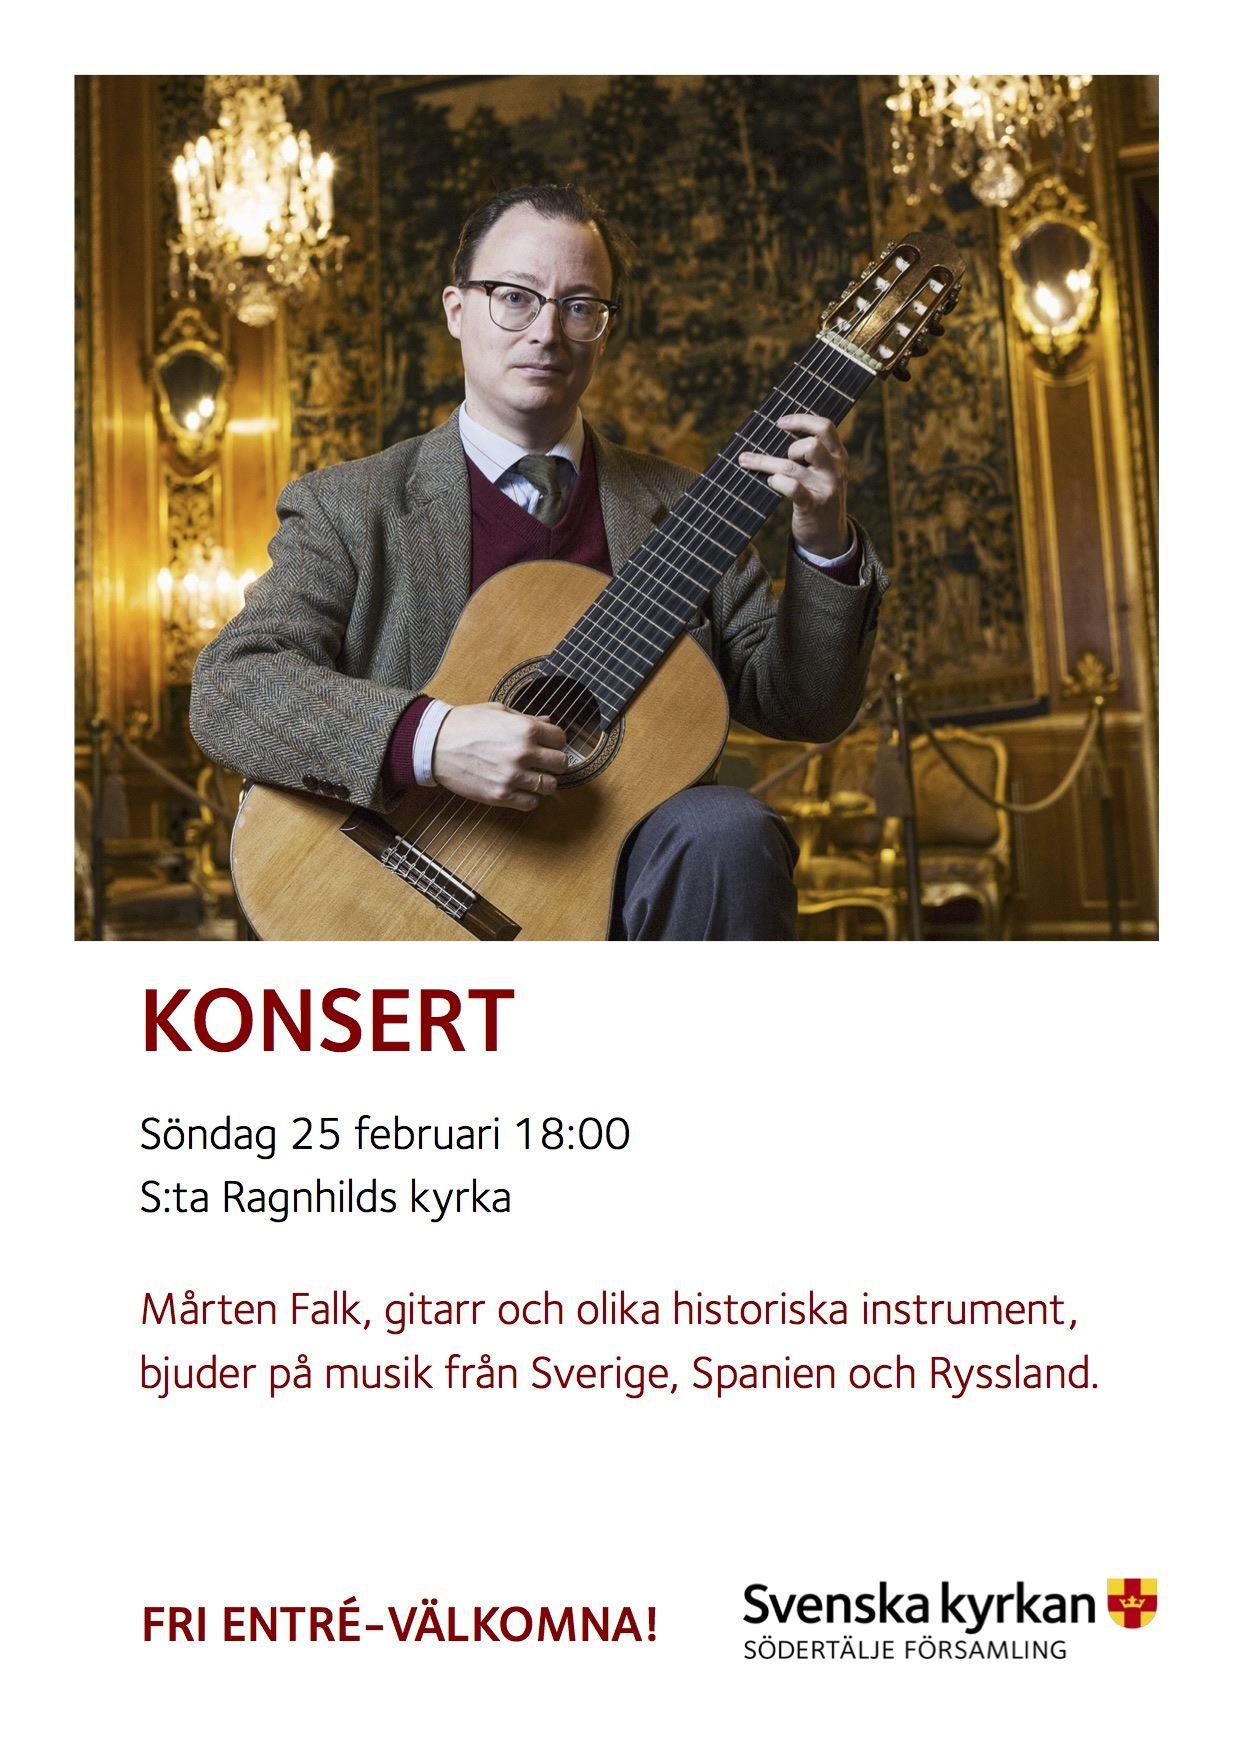 Konsert i S:ta Ragnhilds kyrka